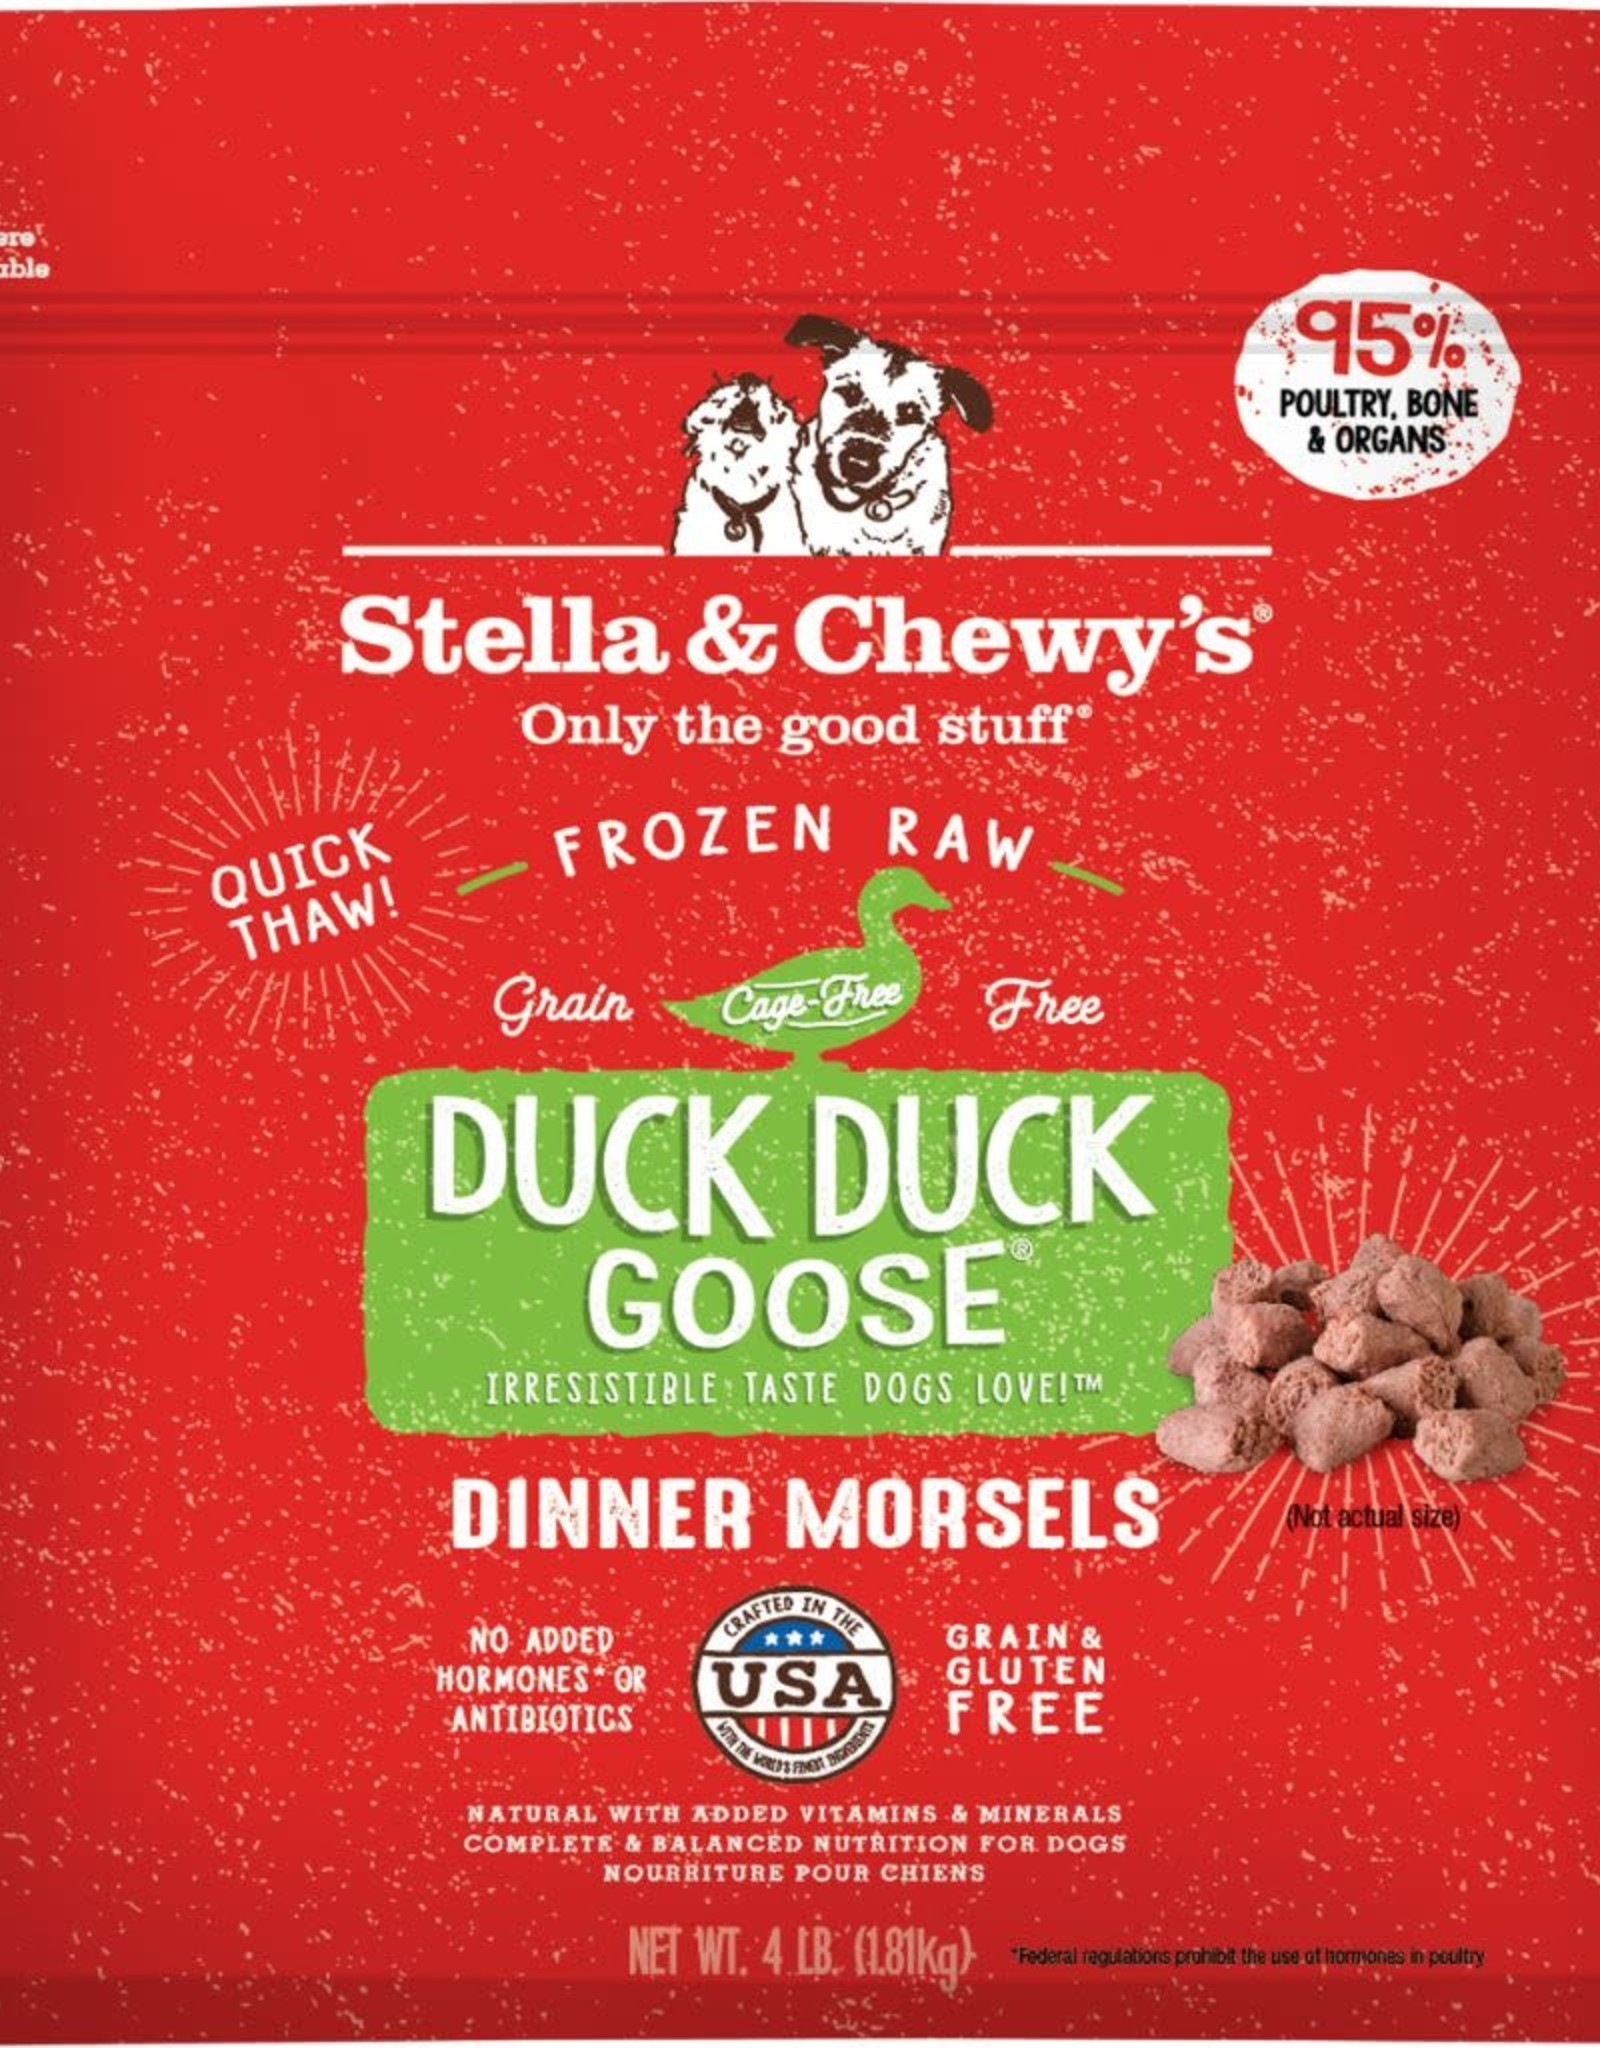 Stella & chewy's Frozen - SC Duck Duck Goose Dinner 4LB